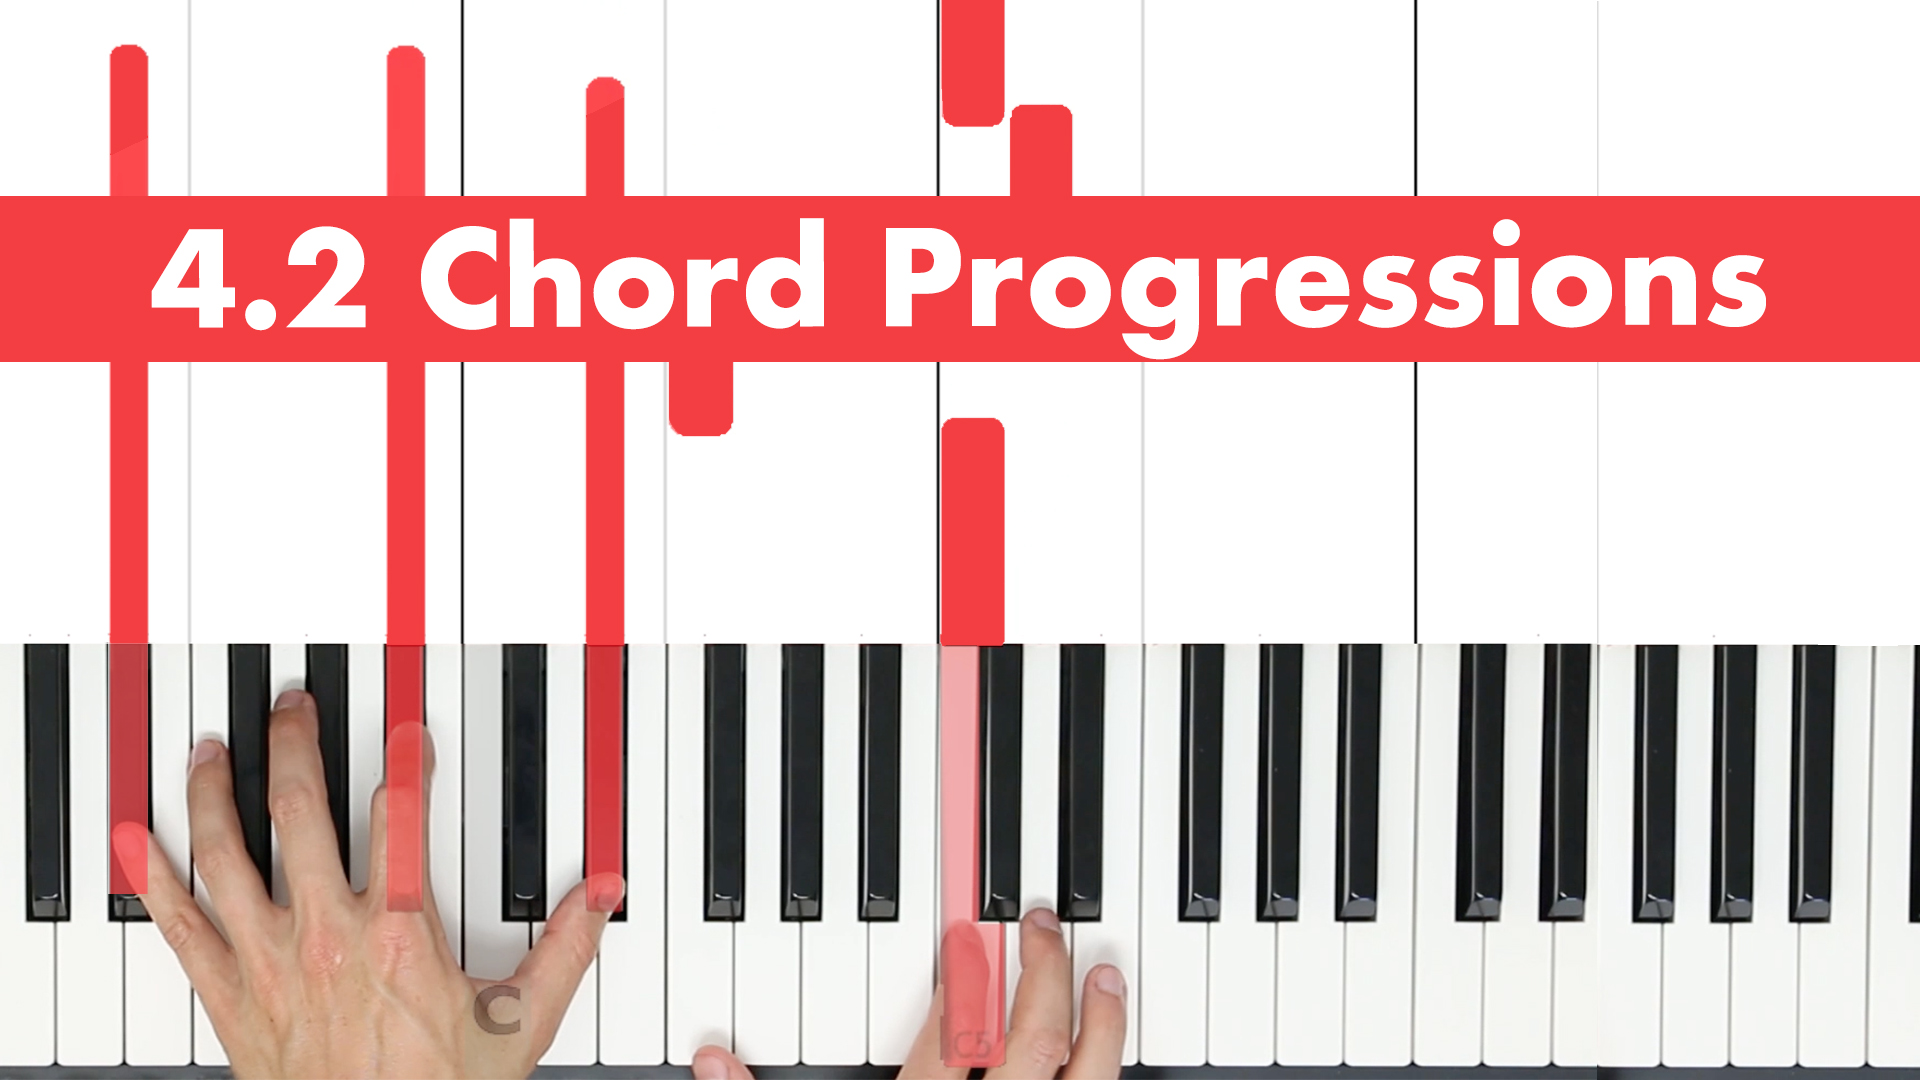 4.2 Chord Progressions